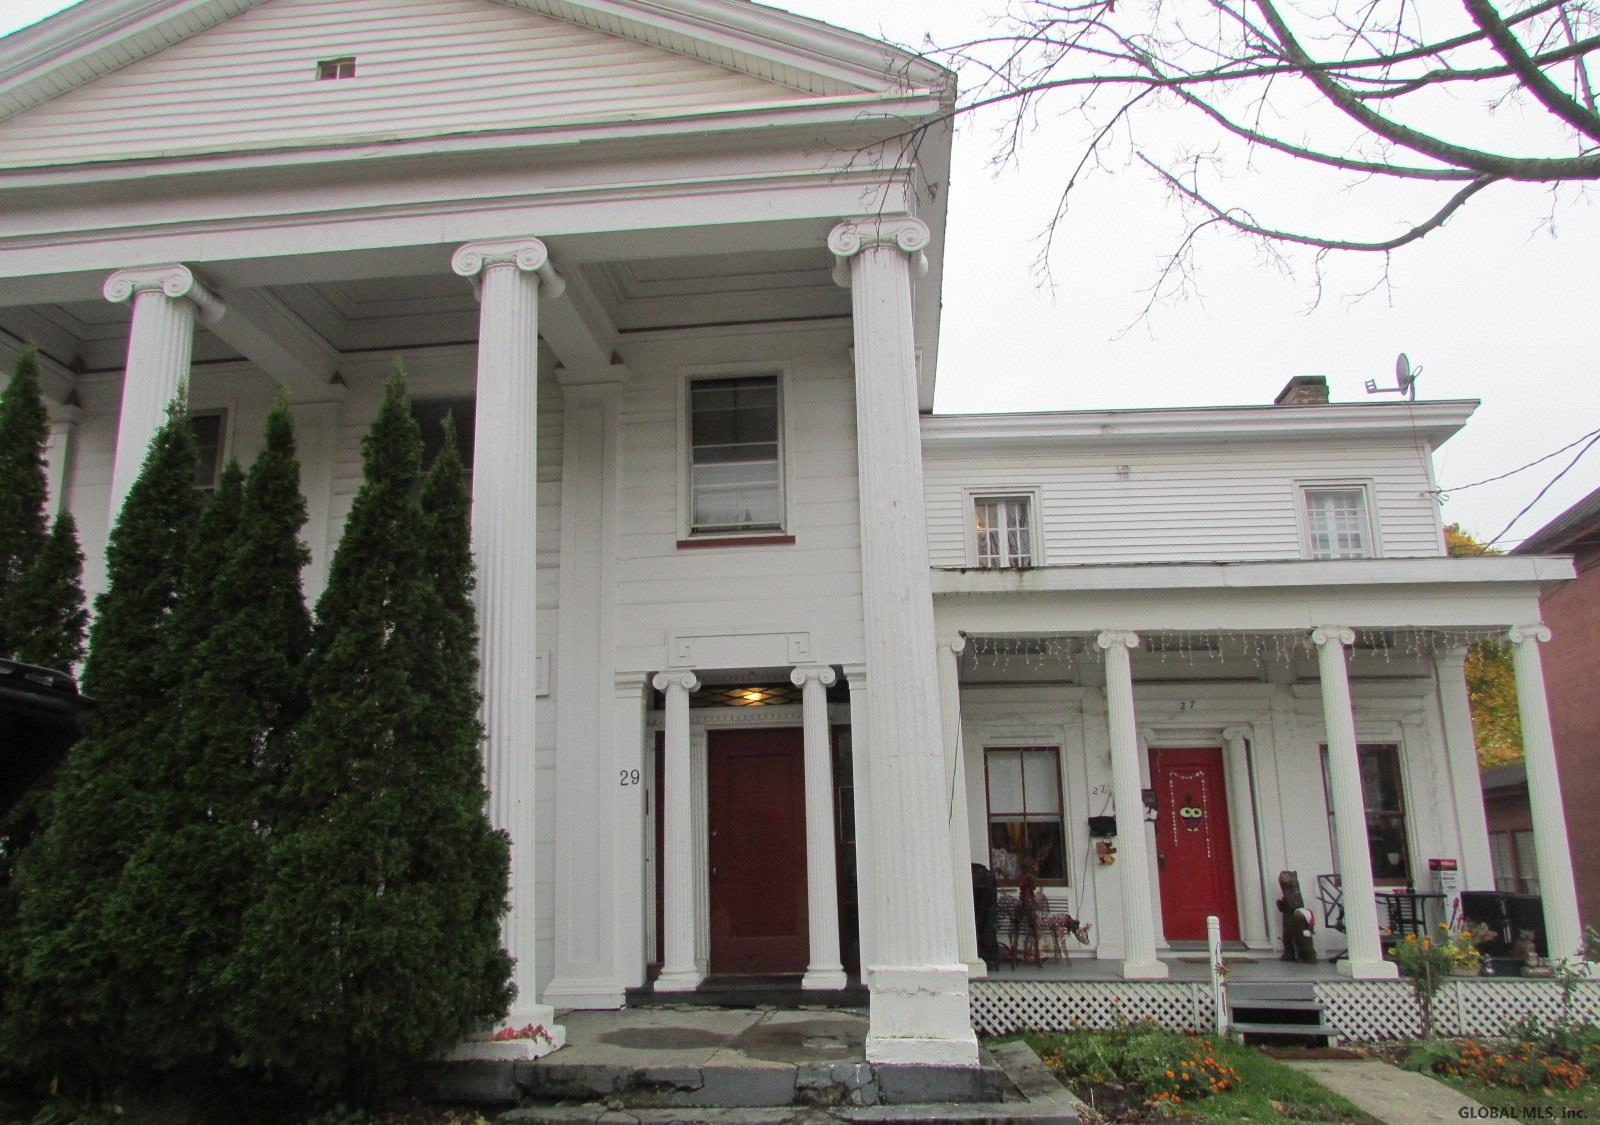 Johnstown image 3